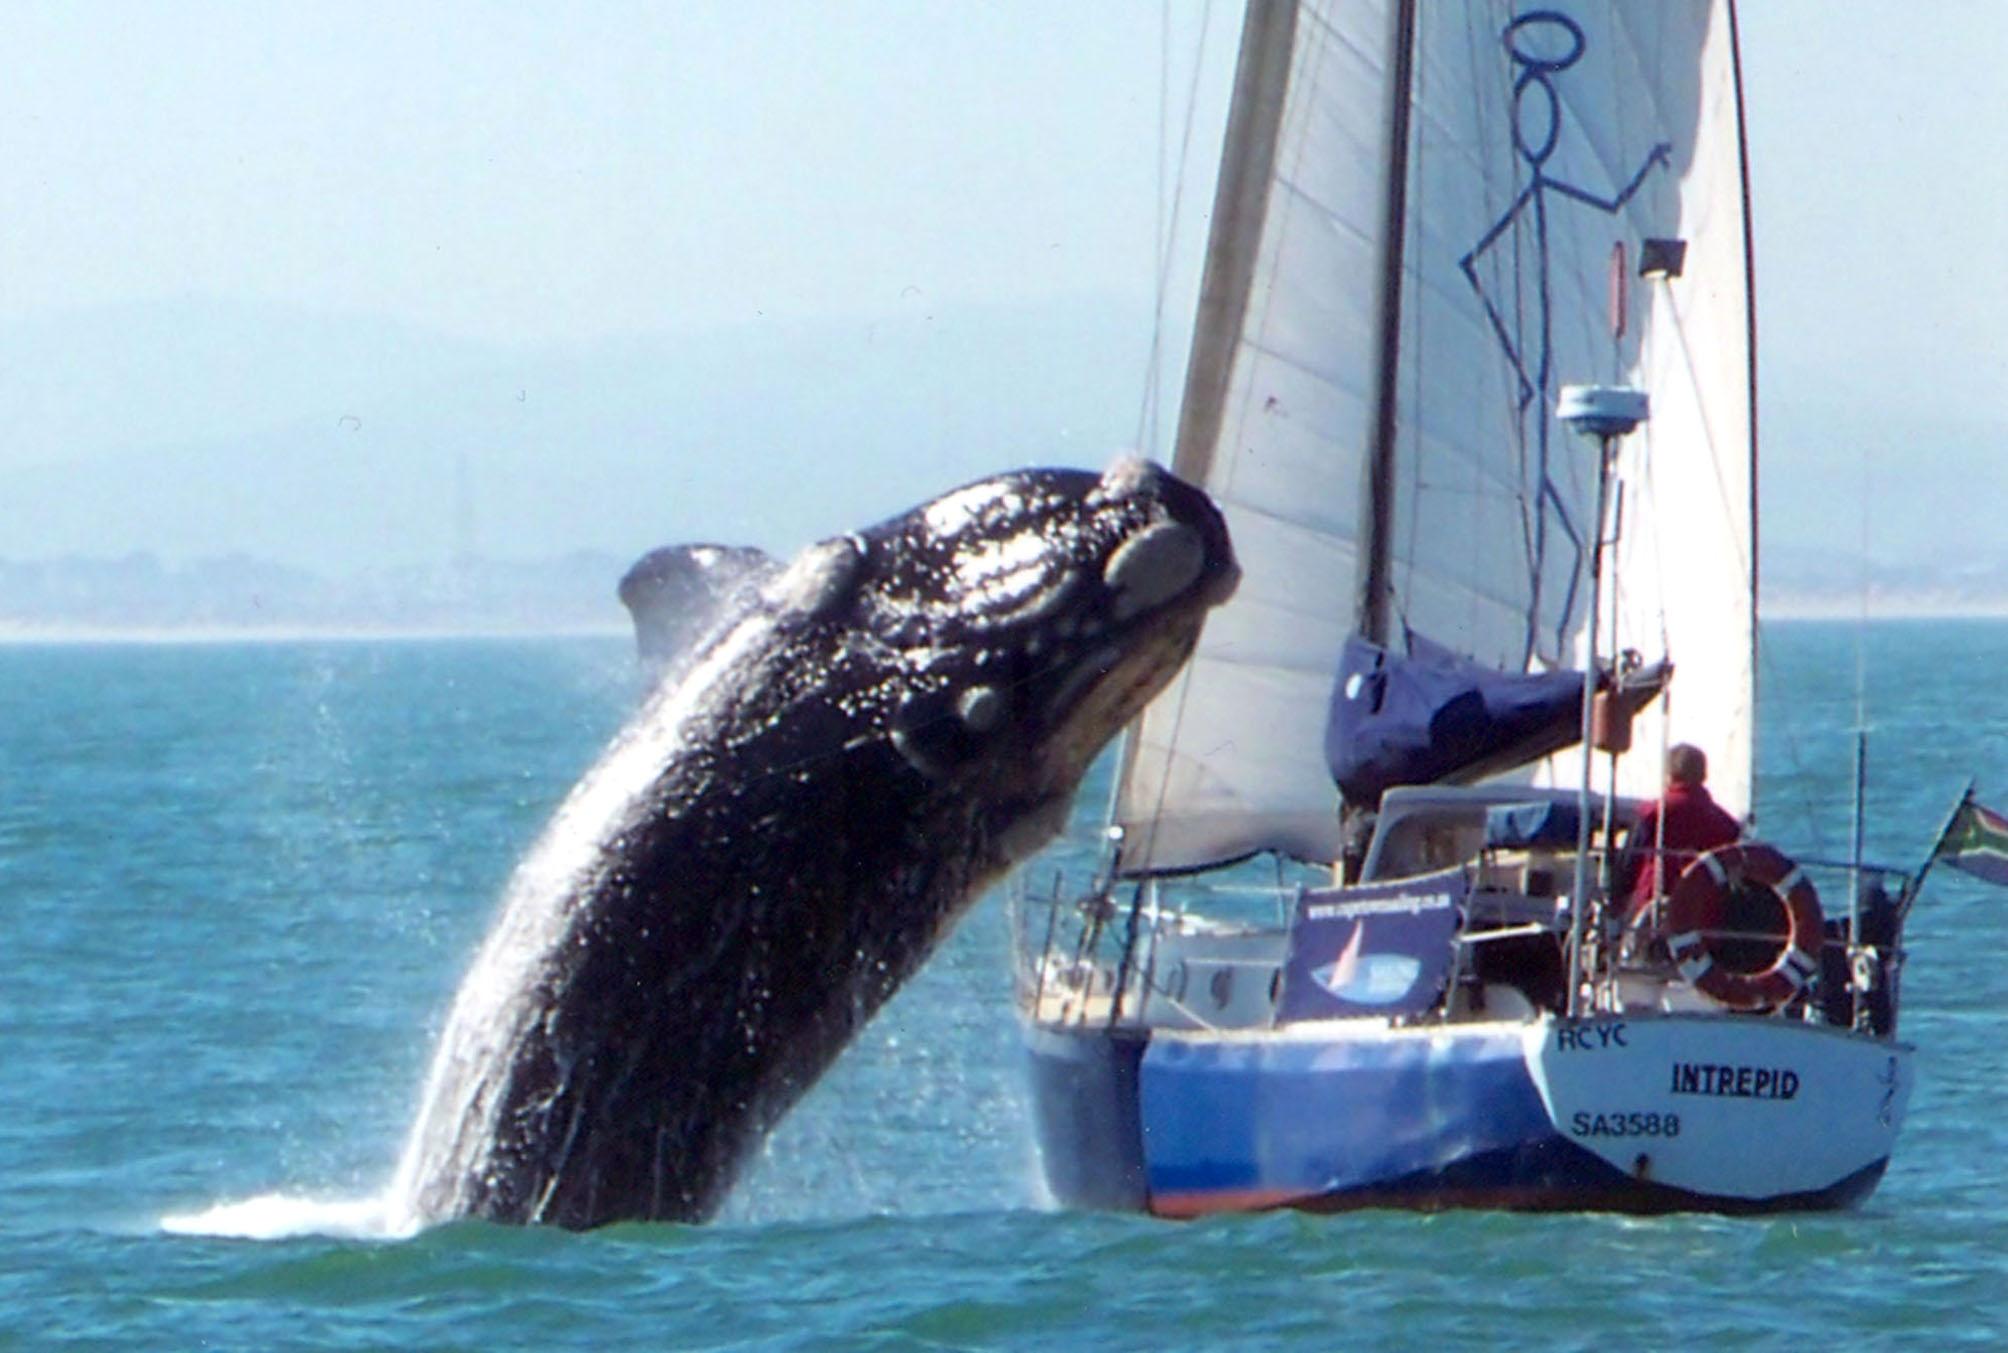 Foto Kronologis Ikan Paus Raksasa Terjang Kapal Pesiar Artikel